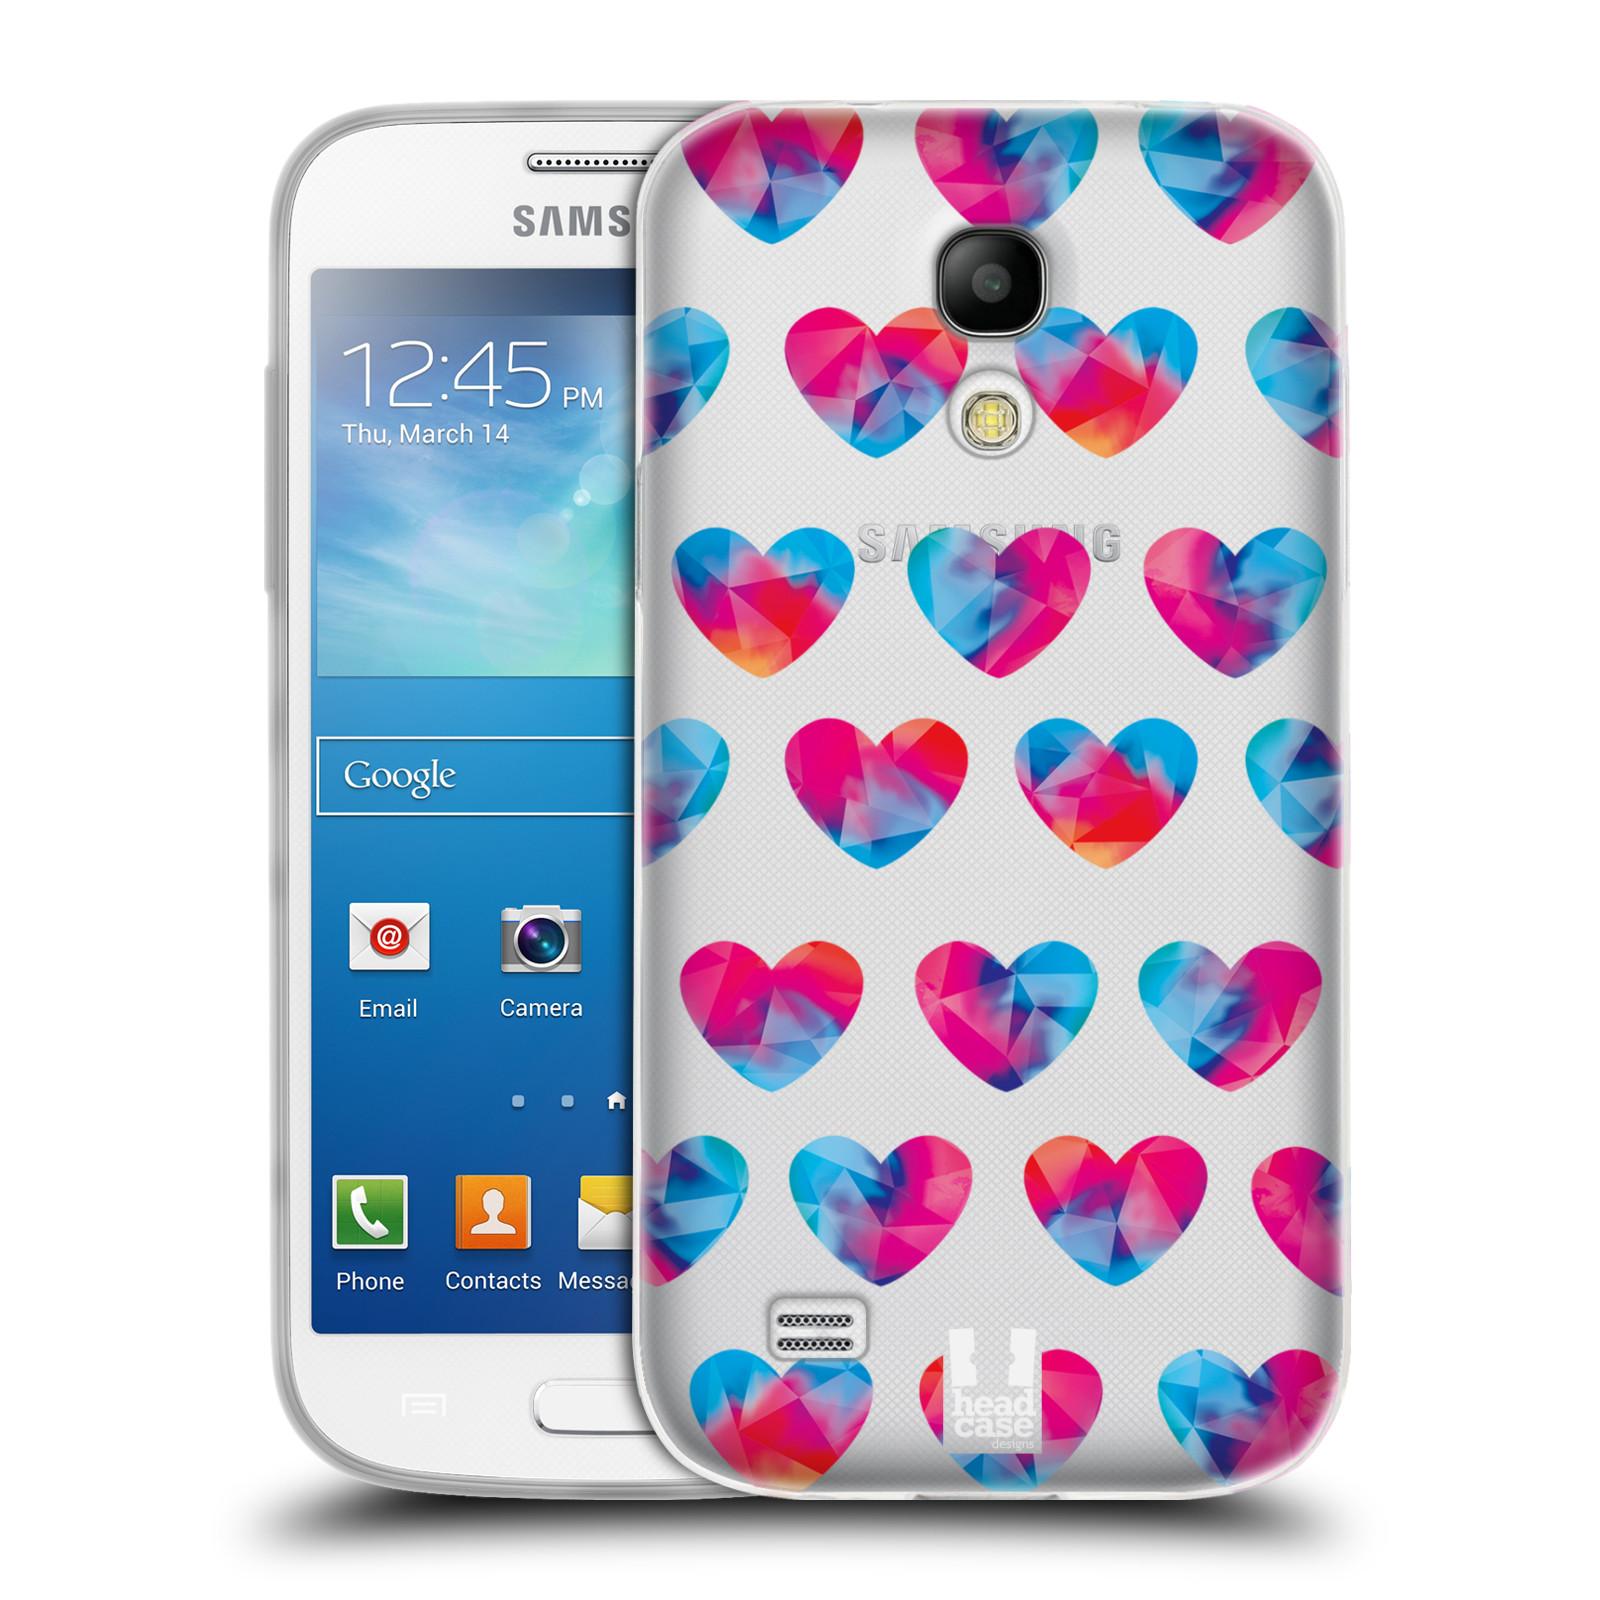 Silikonové pouzdro na mobil Samsung Galaxy S4 Mini VE - Head Case - Srdíčka hrající barvami